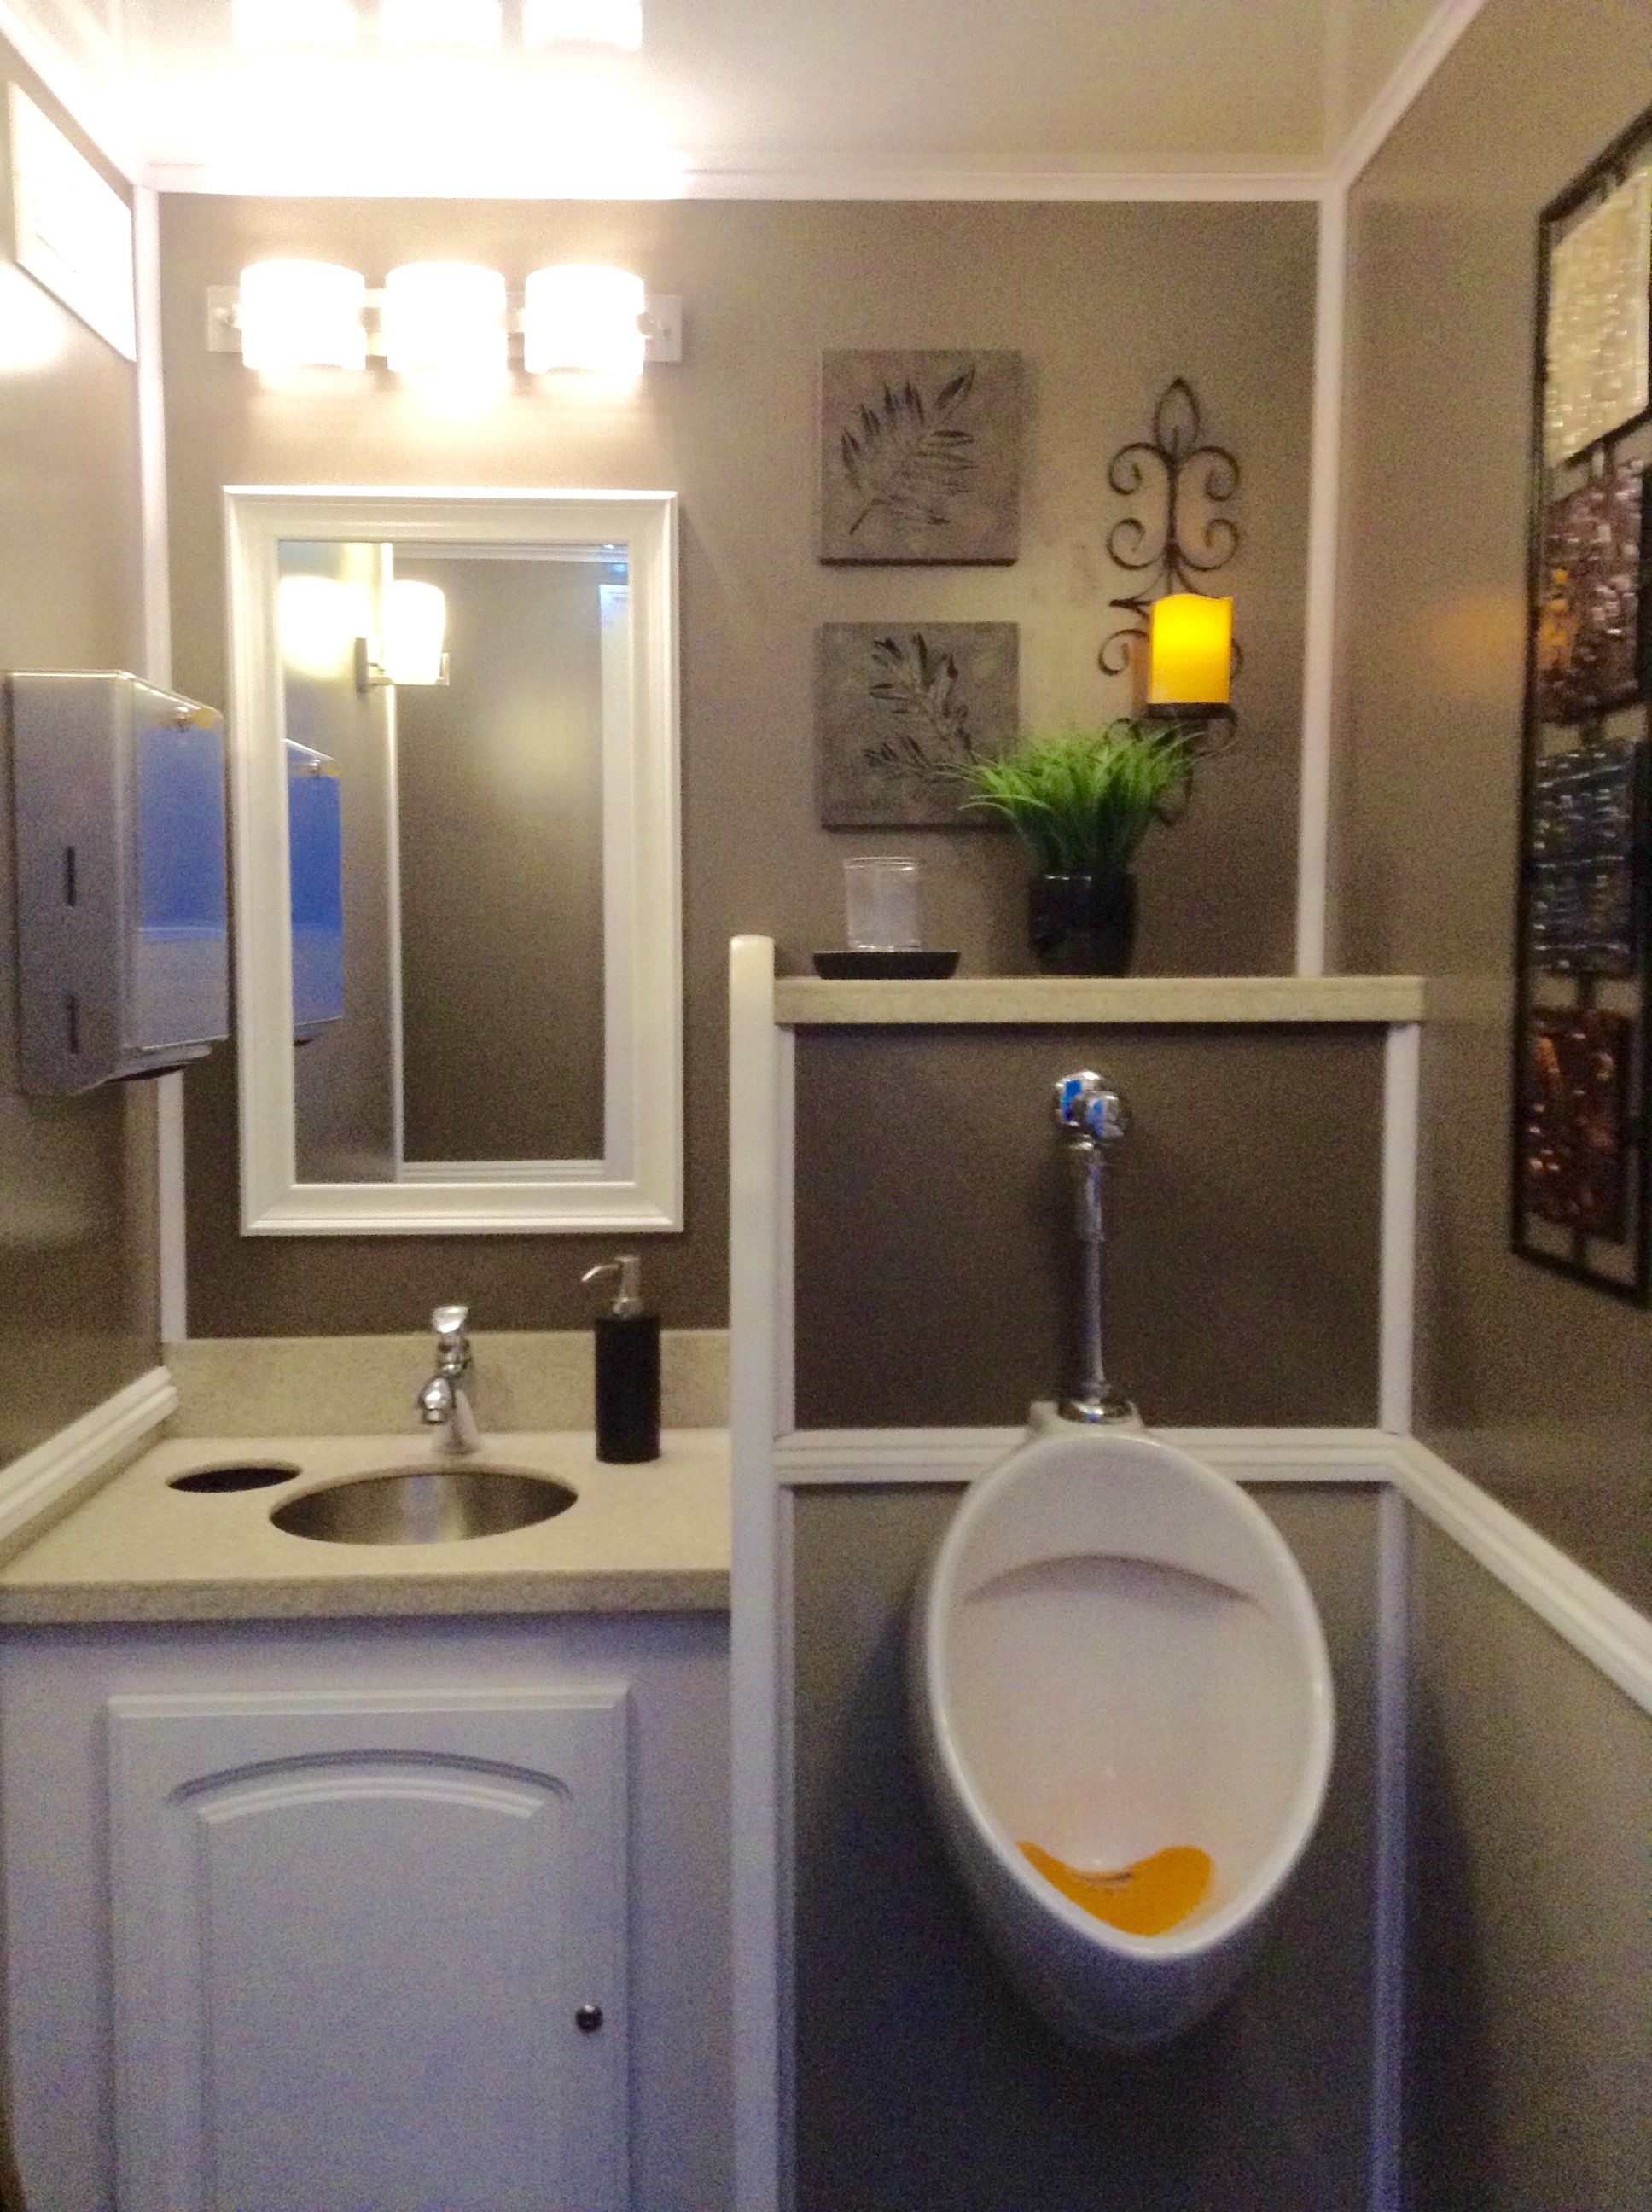 Two Stall Solar Spa Restroom Trailer Rental Royal Throne